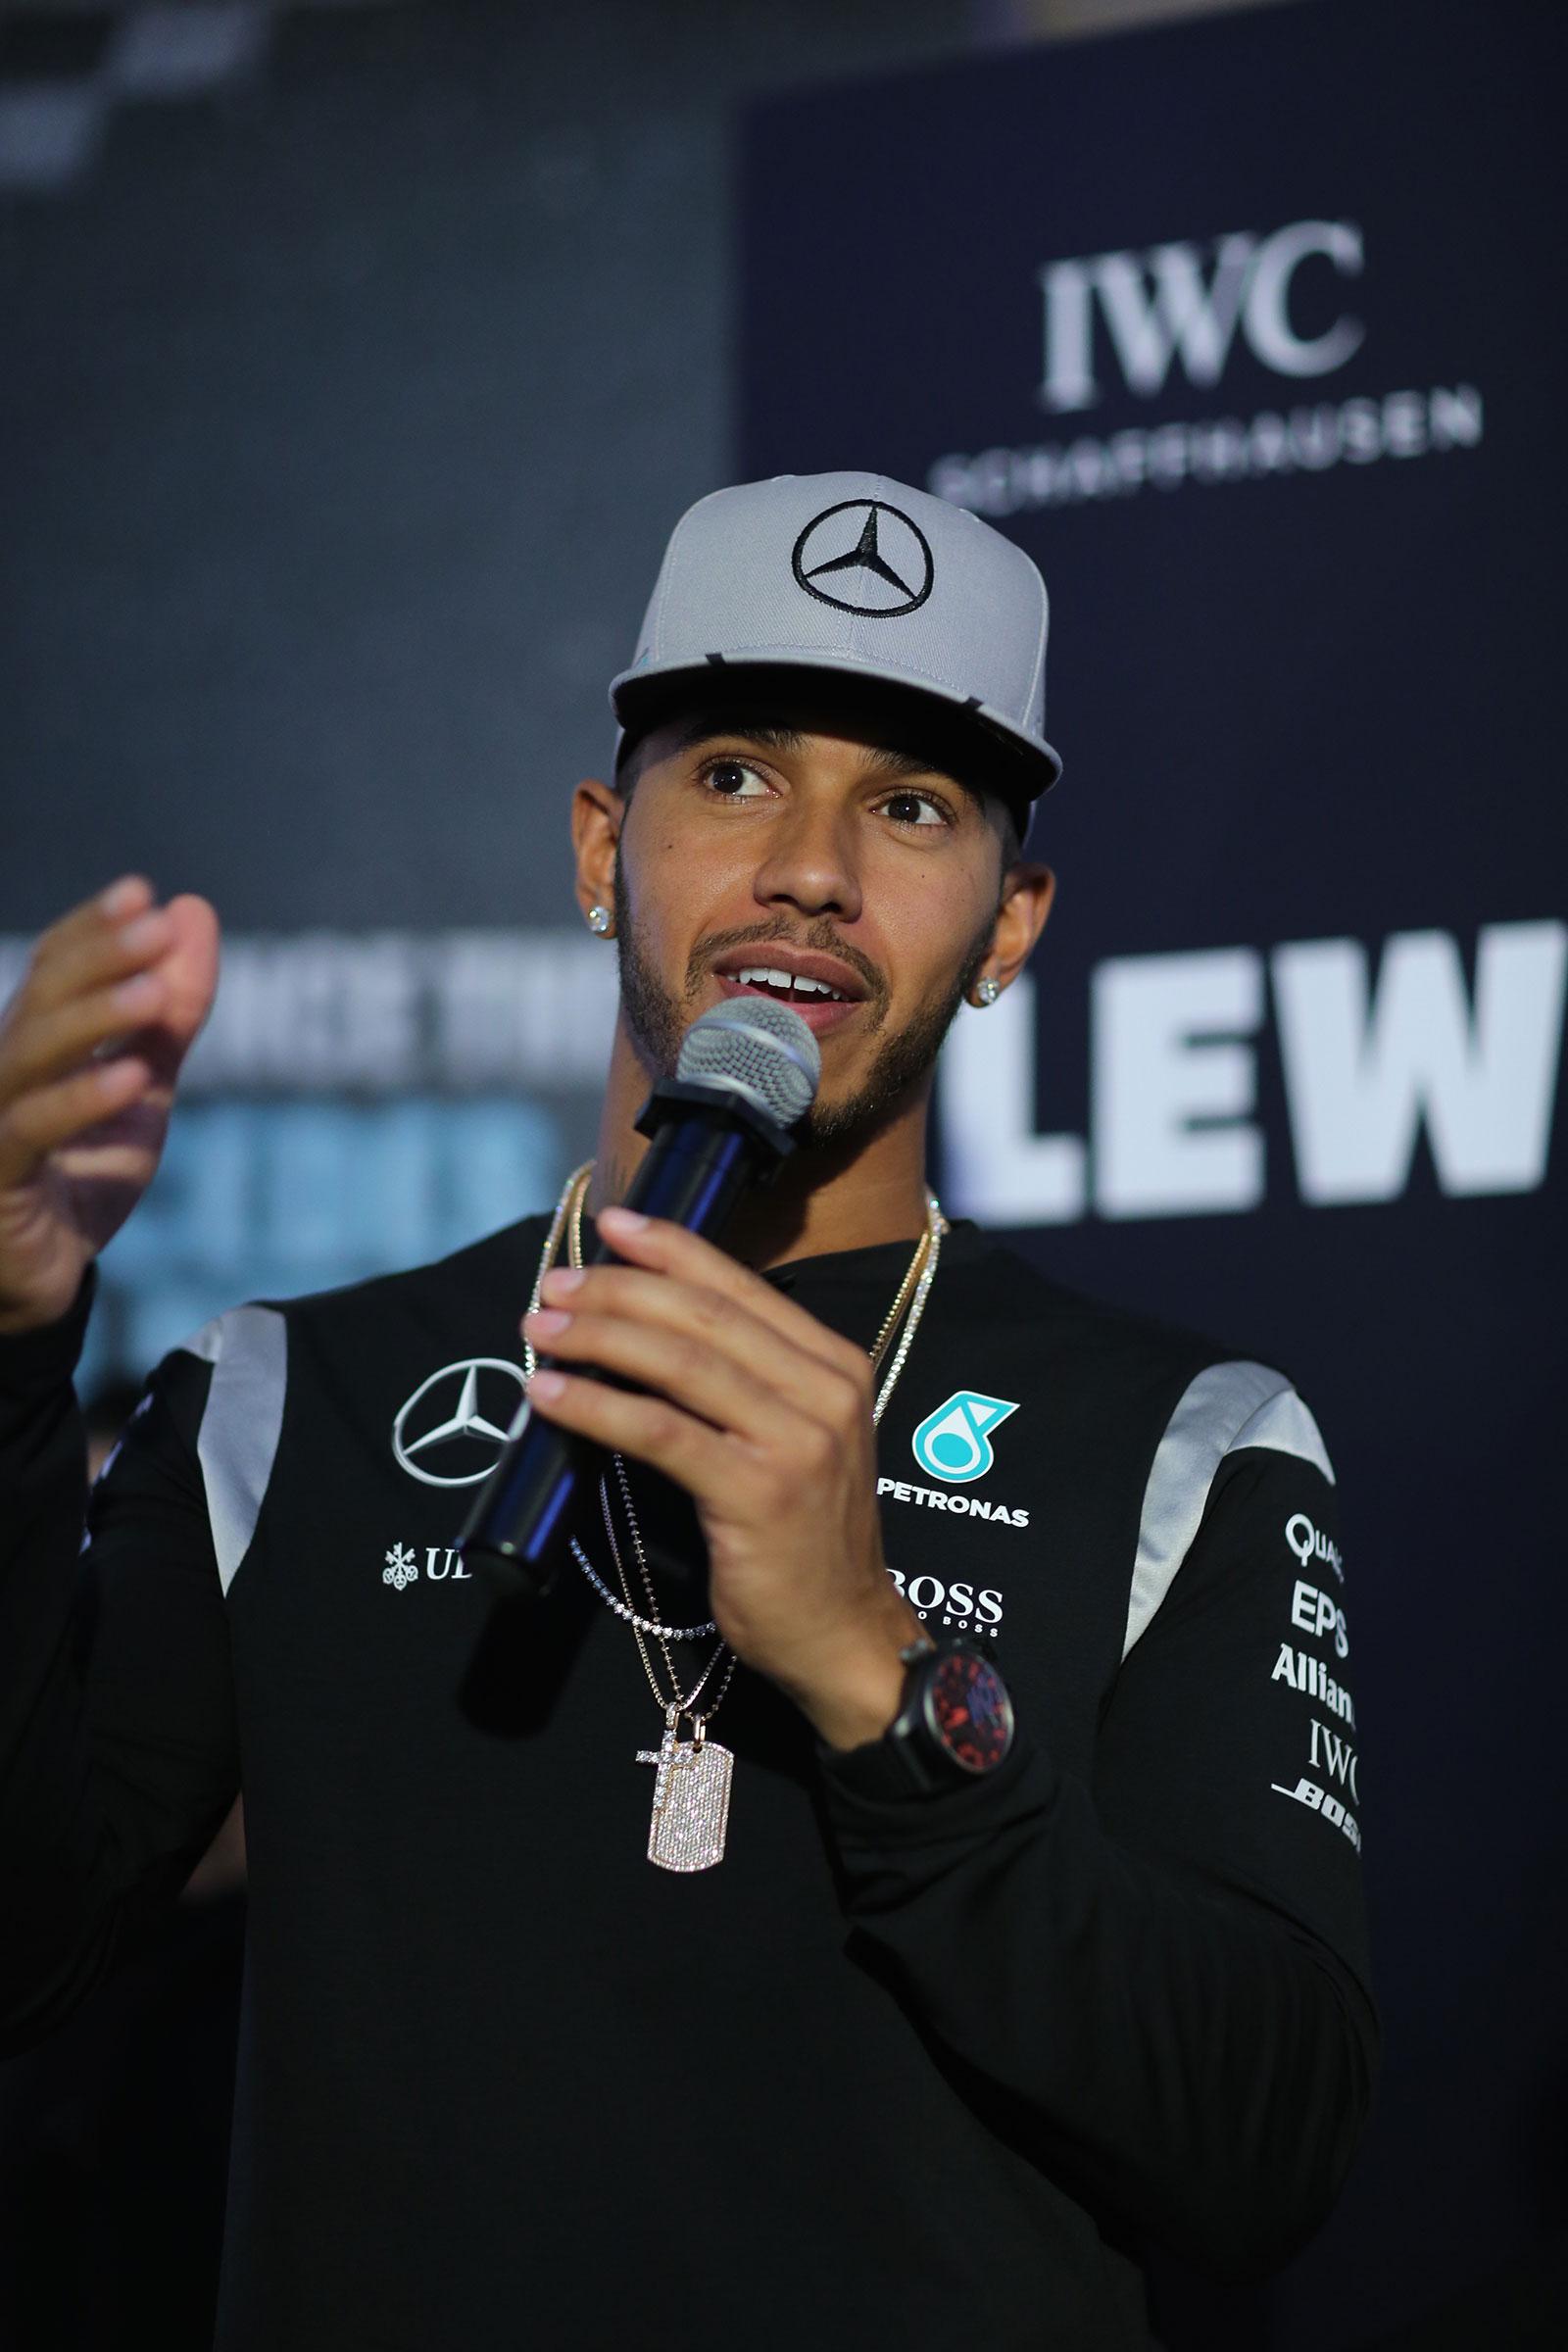 IWC Singapore Grand Prix 2016 Lewis Hamilton 4